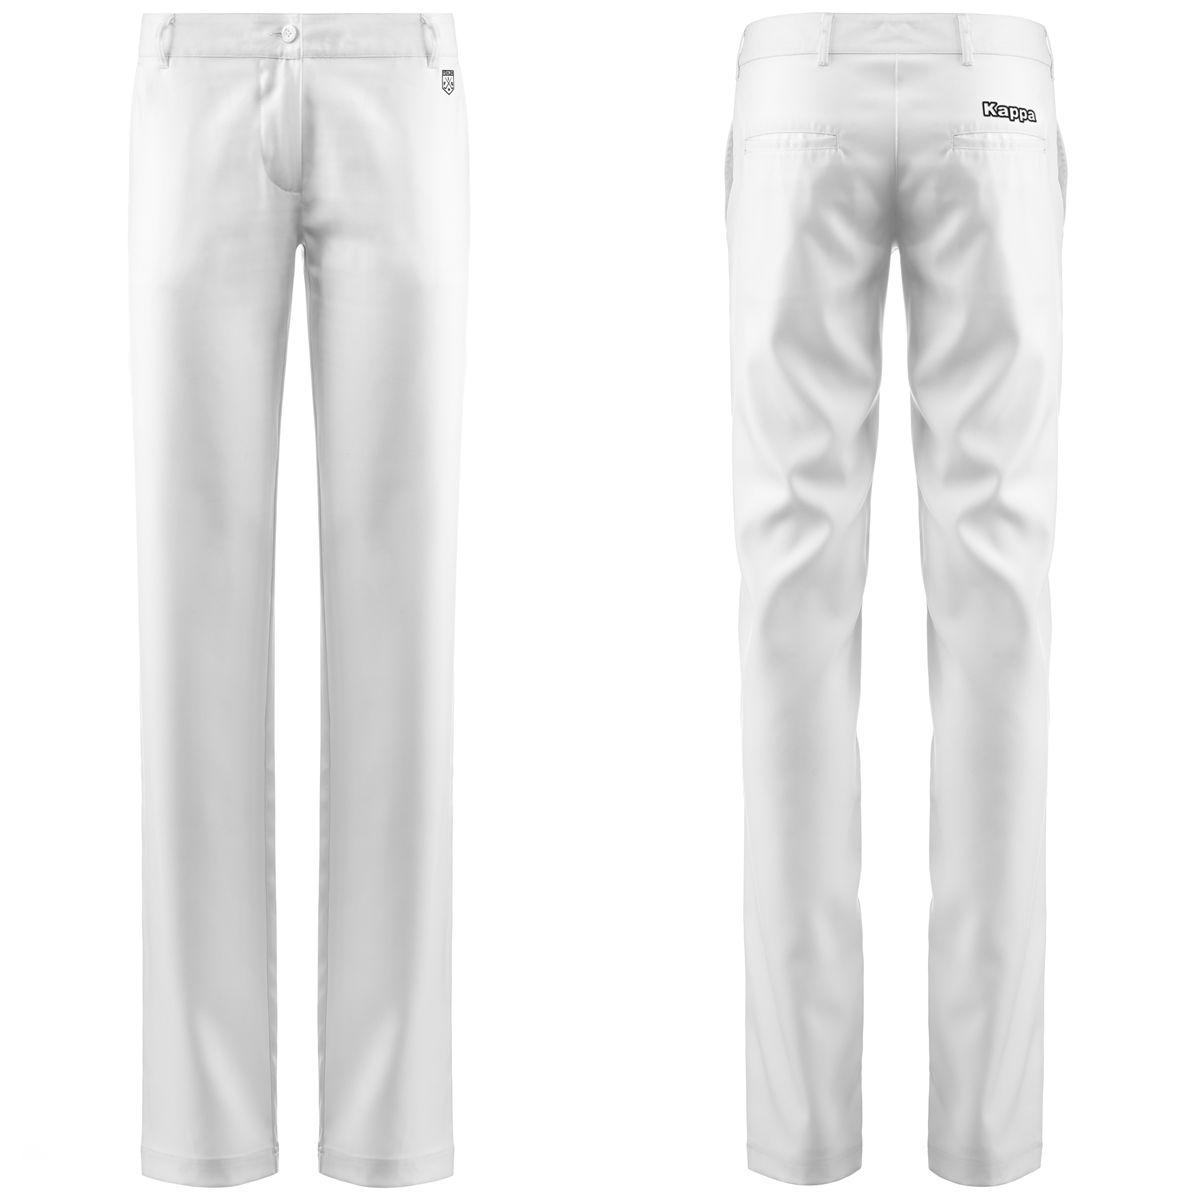 Kappa Pantaloni donna-302RC70